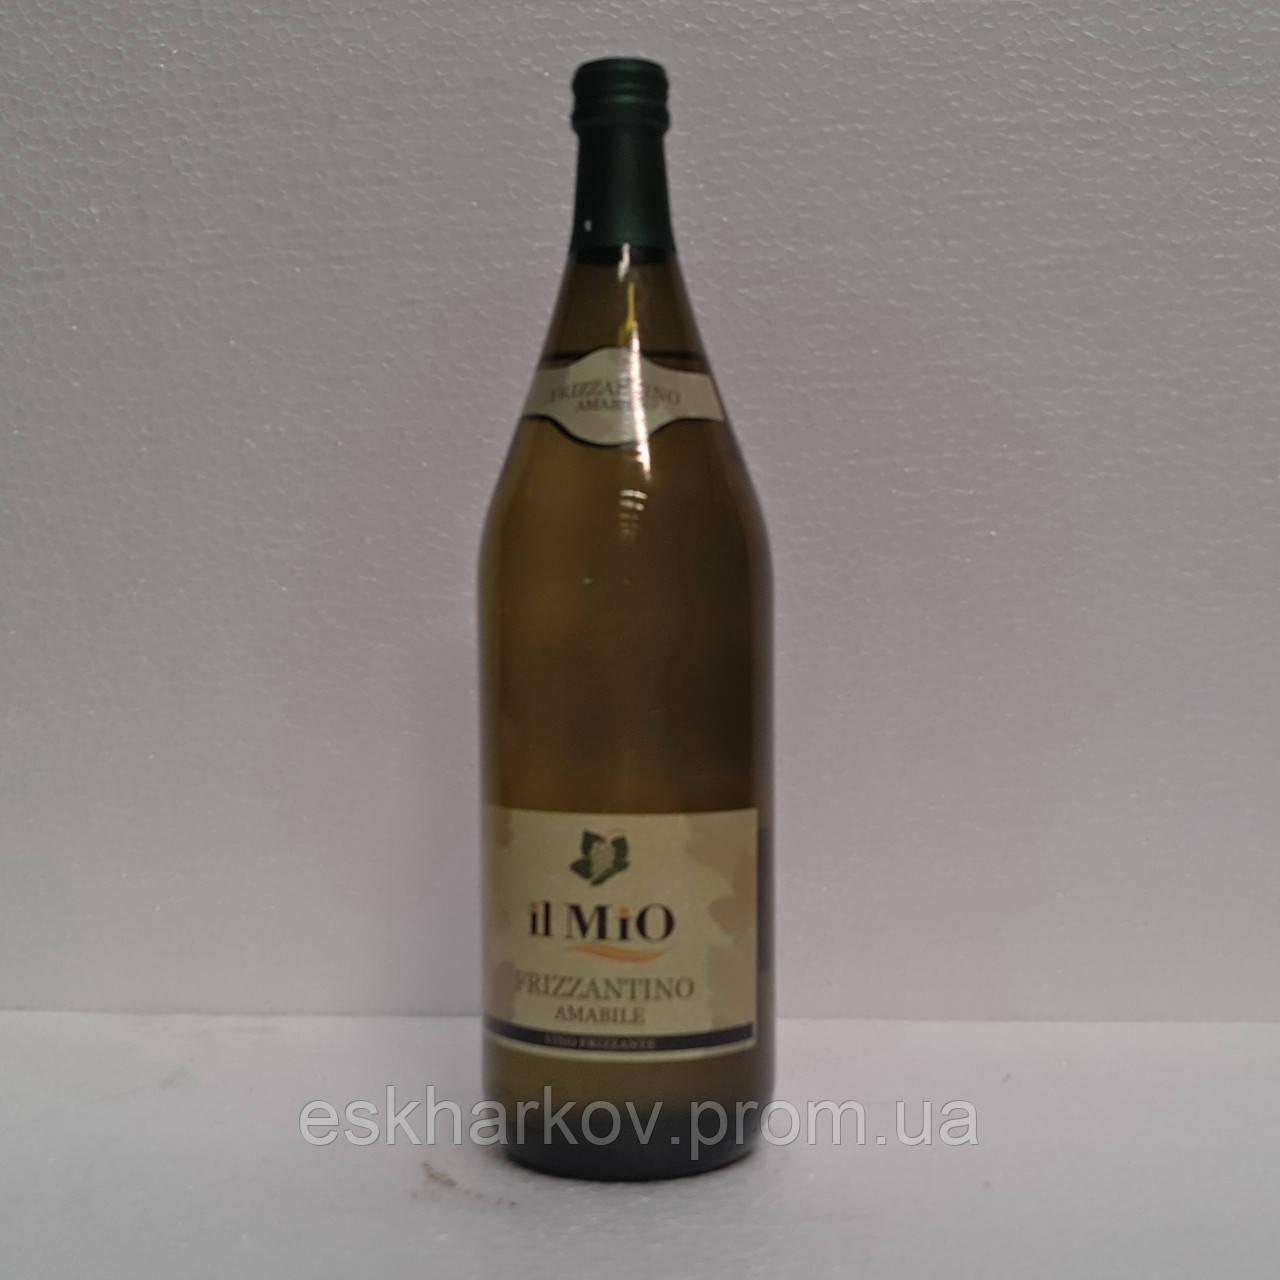 Вино игристое Frizzantino Amabile il Mio 1,5L - EuroShop.Kharkov в Харькове